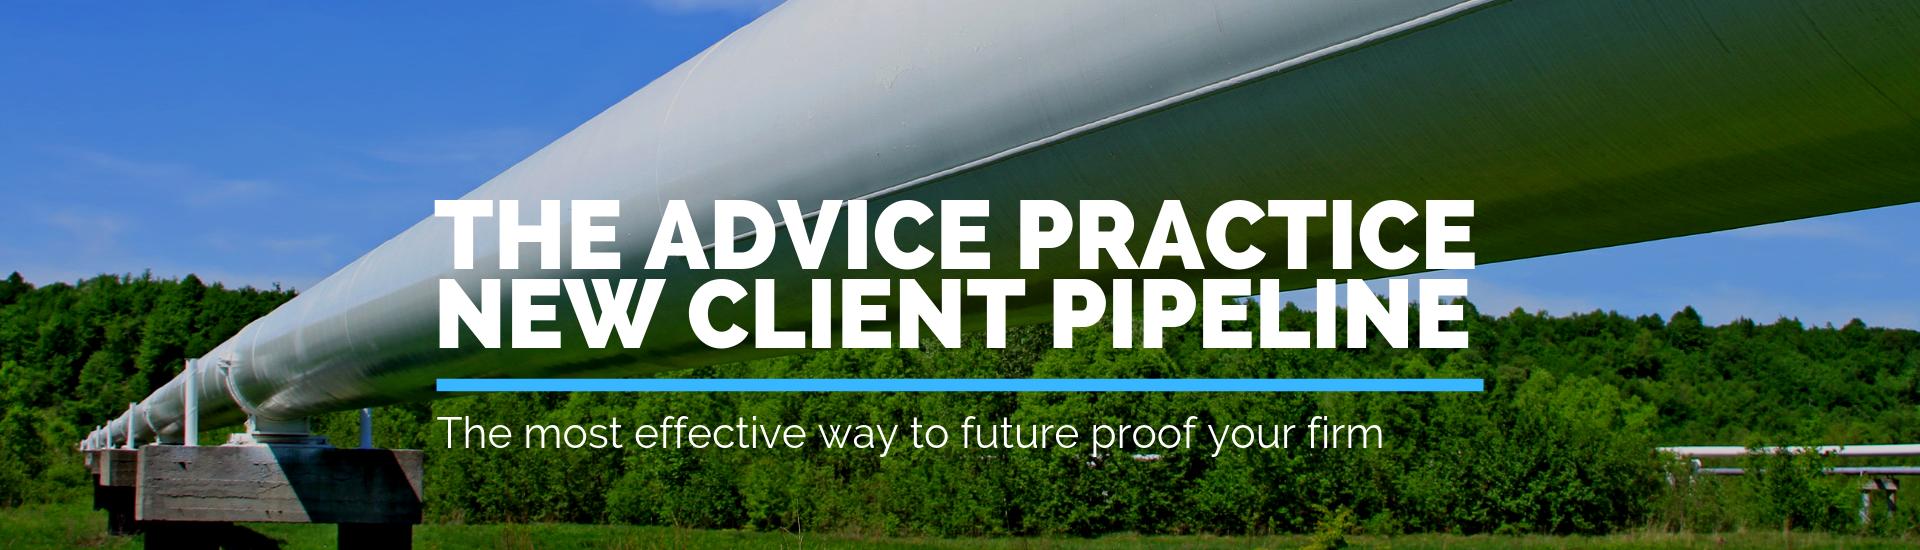 The Advice Practice New Client Pipeline   Andrew Abel   Advisio